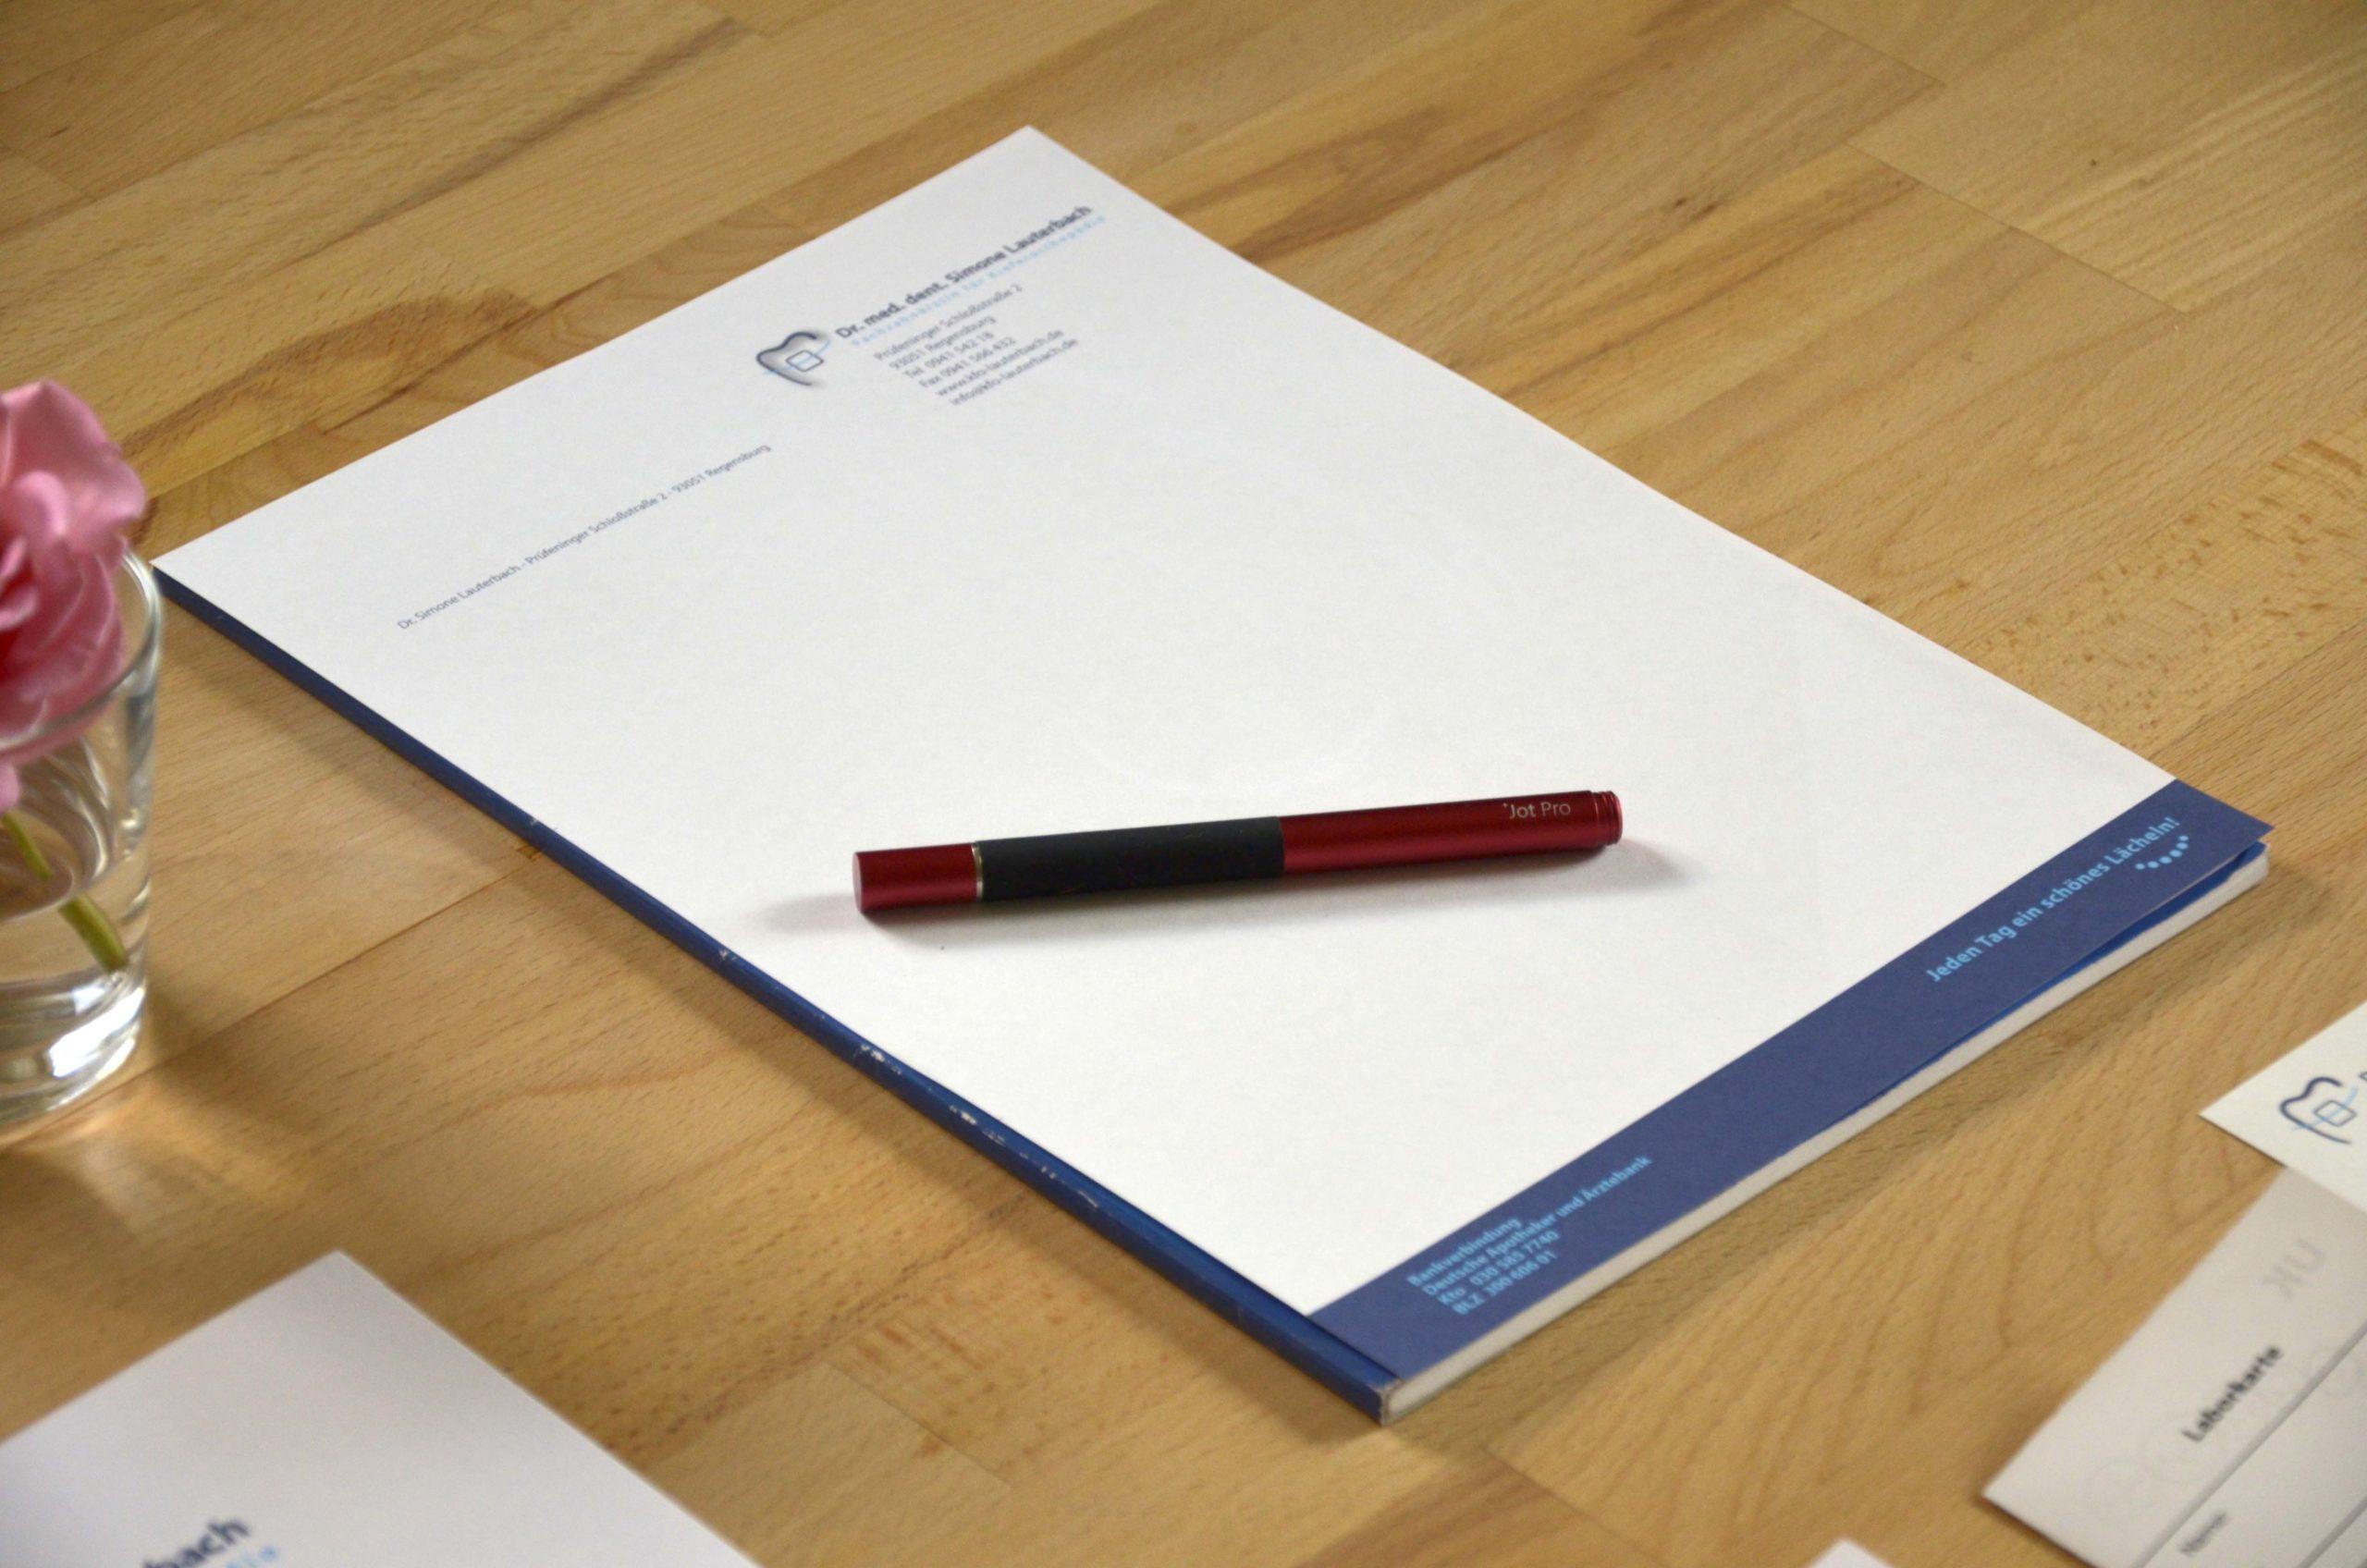 Briefpapier KFO-Praxis Lauterbach